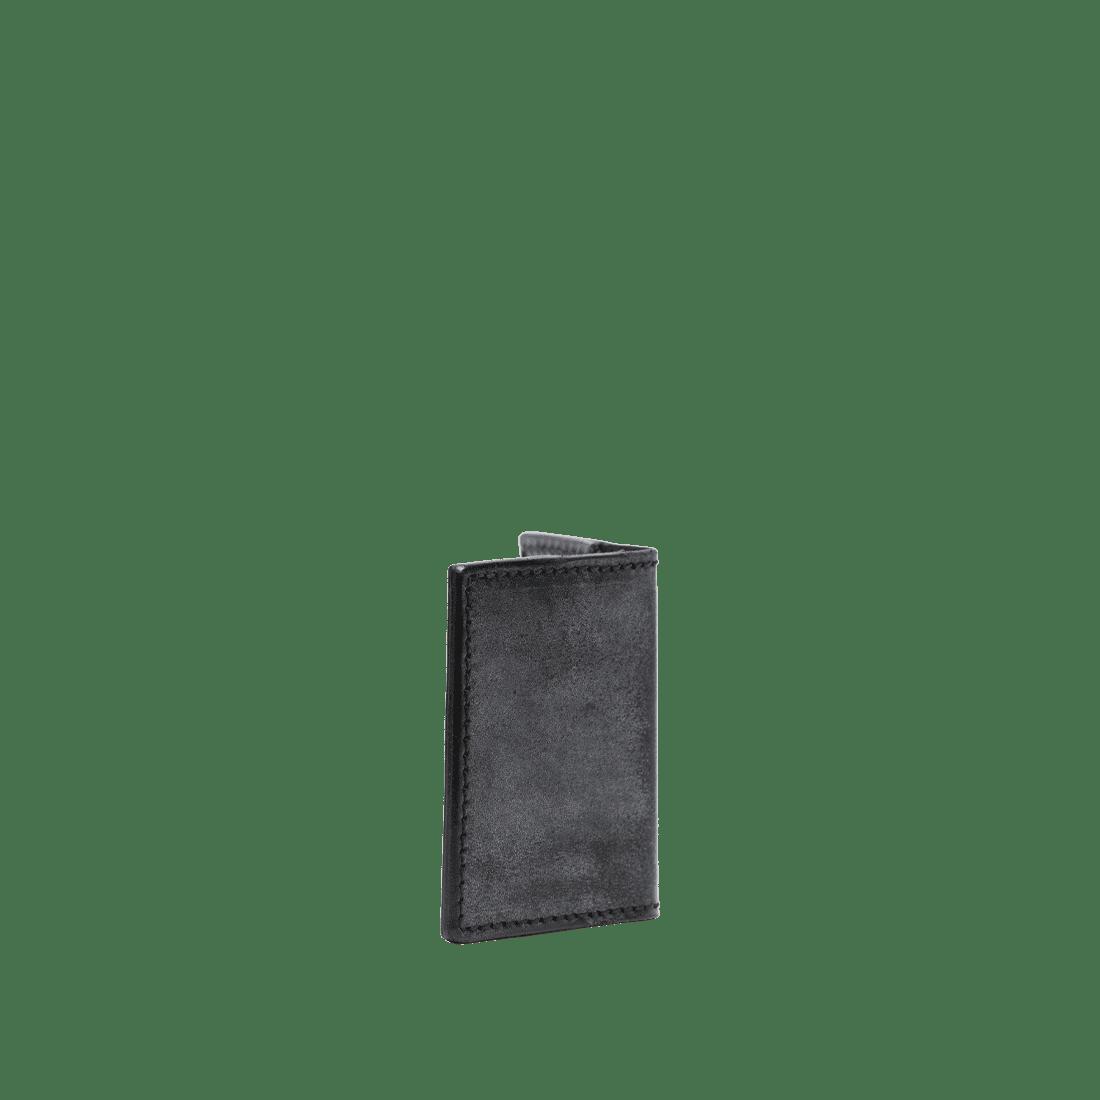 The Double Oak Card Holder Black